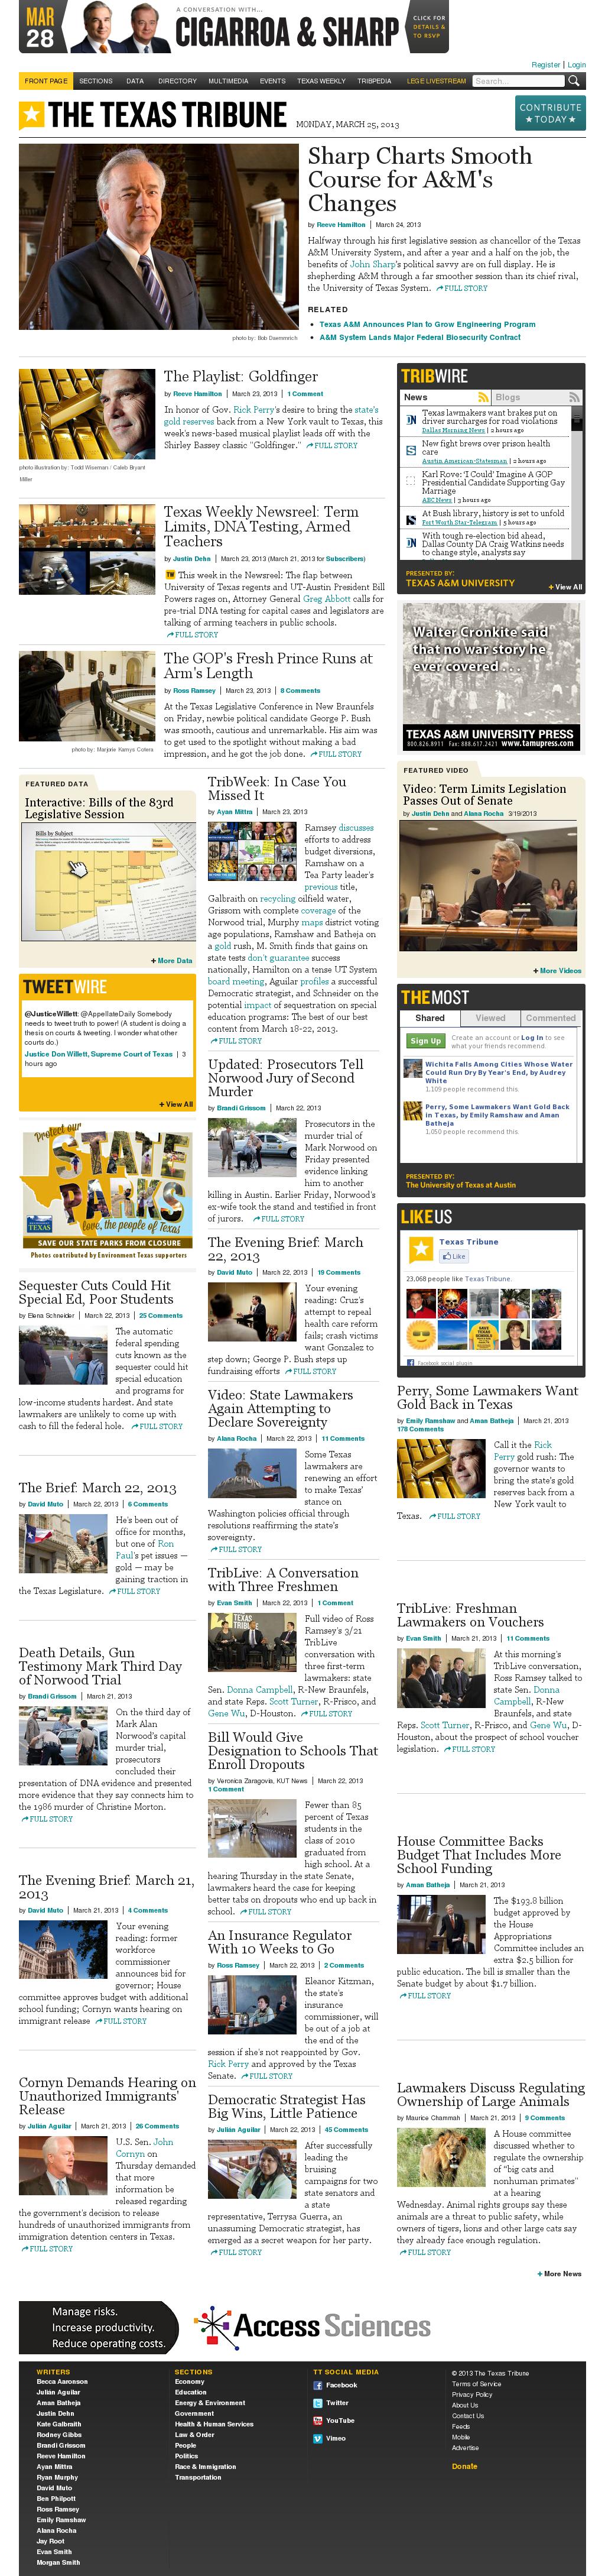 The Texas Tribune at Monday March 25, 2013, 7:44 a.m. UTC